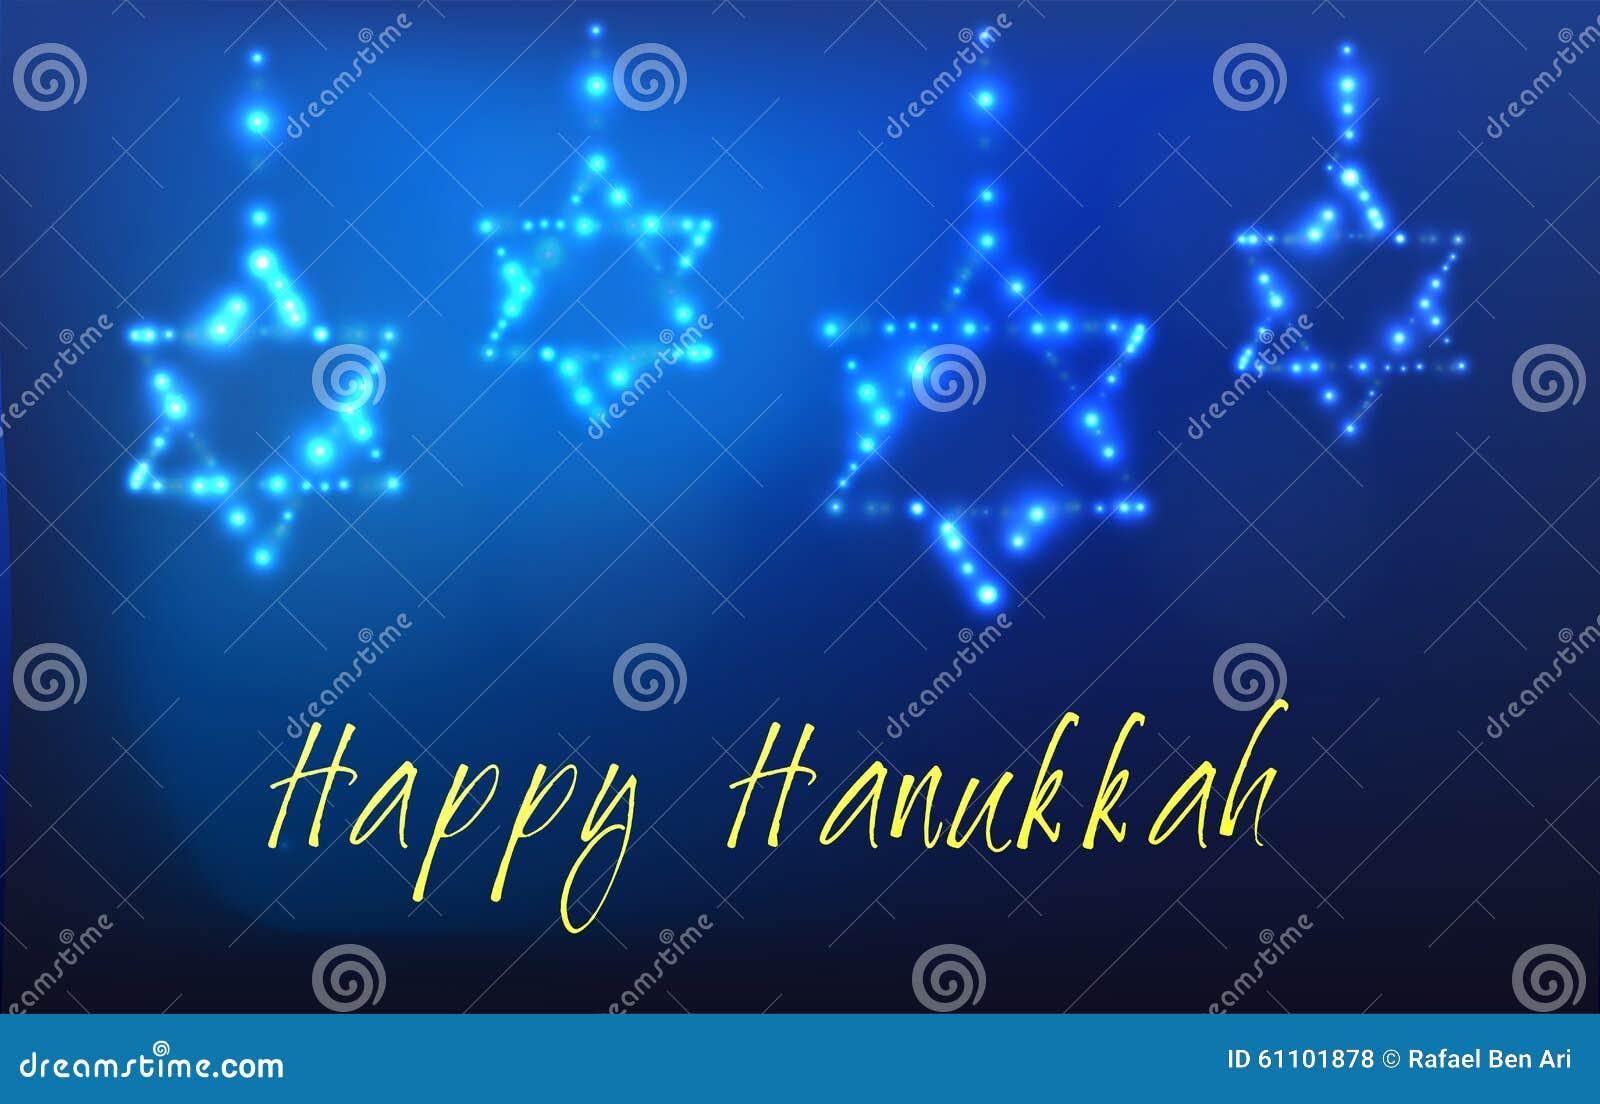 Jewish holiday hanukkah greeting card stock vector illustration of download jewish holiday hanukkah greeting card stock vector illustration of illustration david 61101878 m4hsunfo